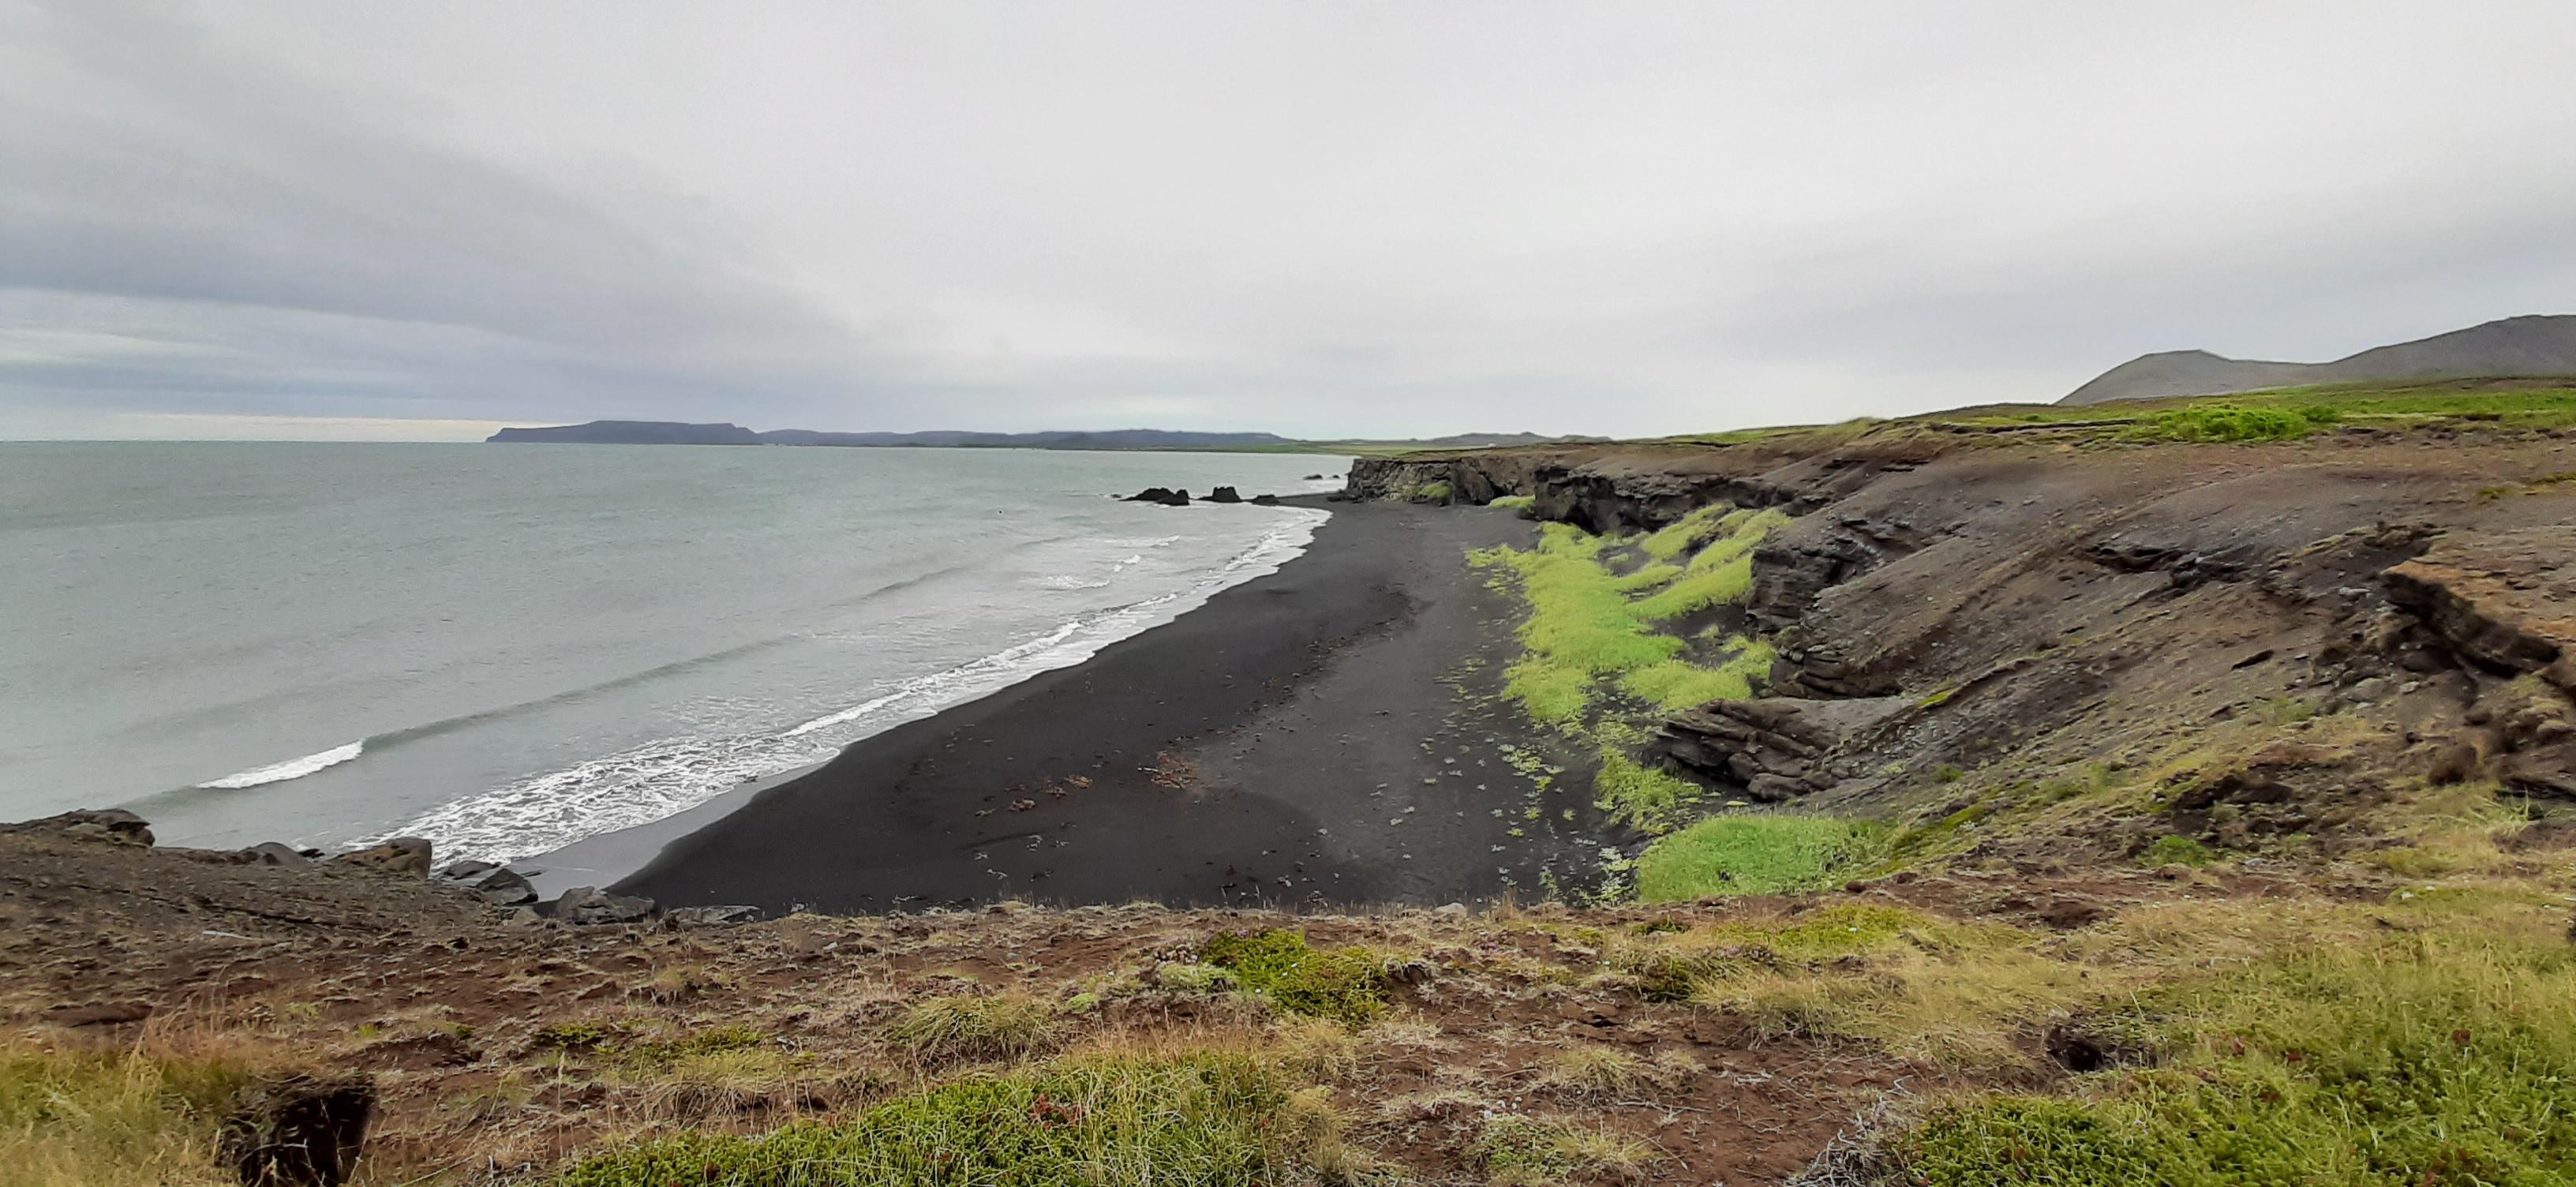 Road 85, North Iceland